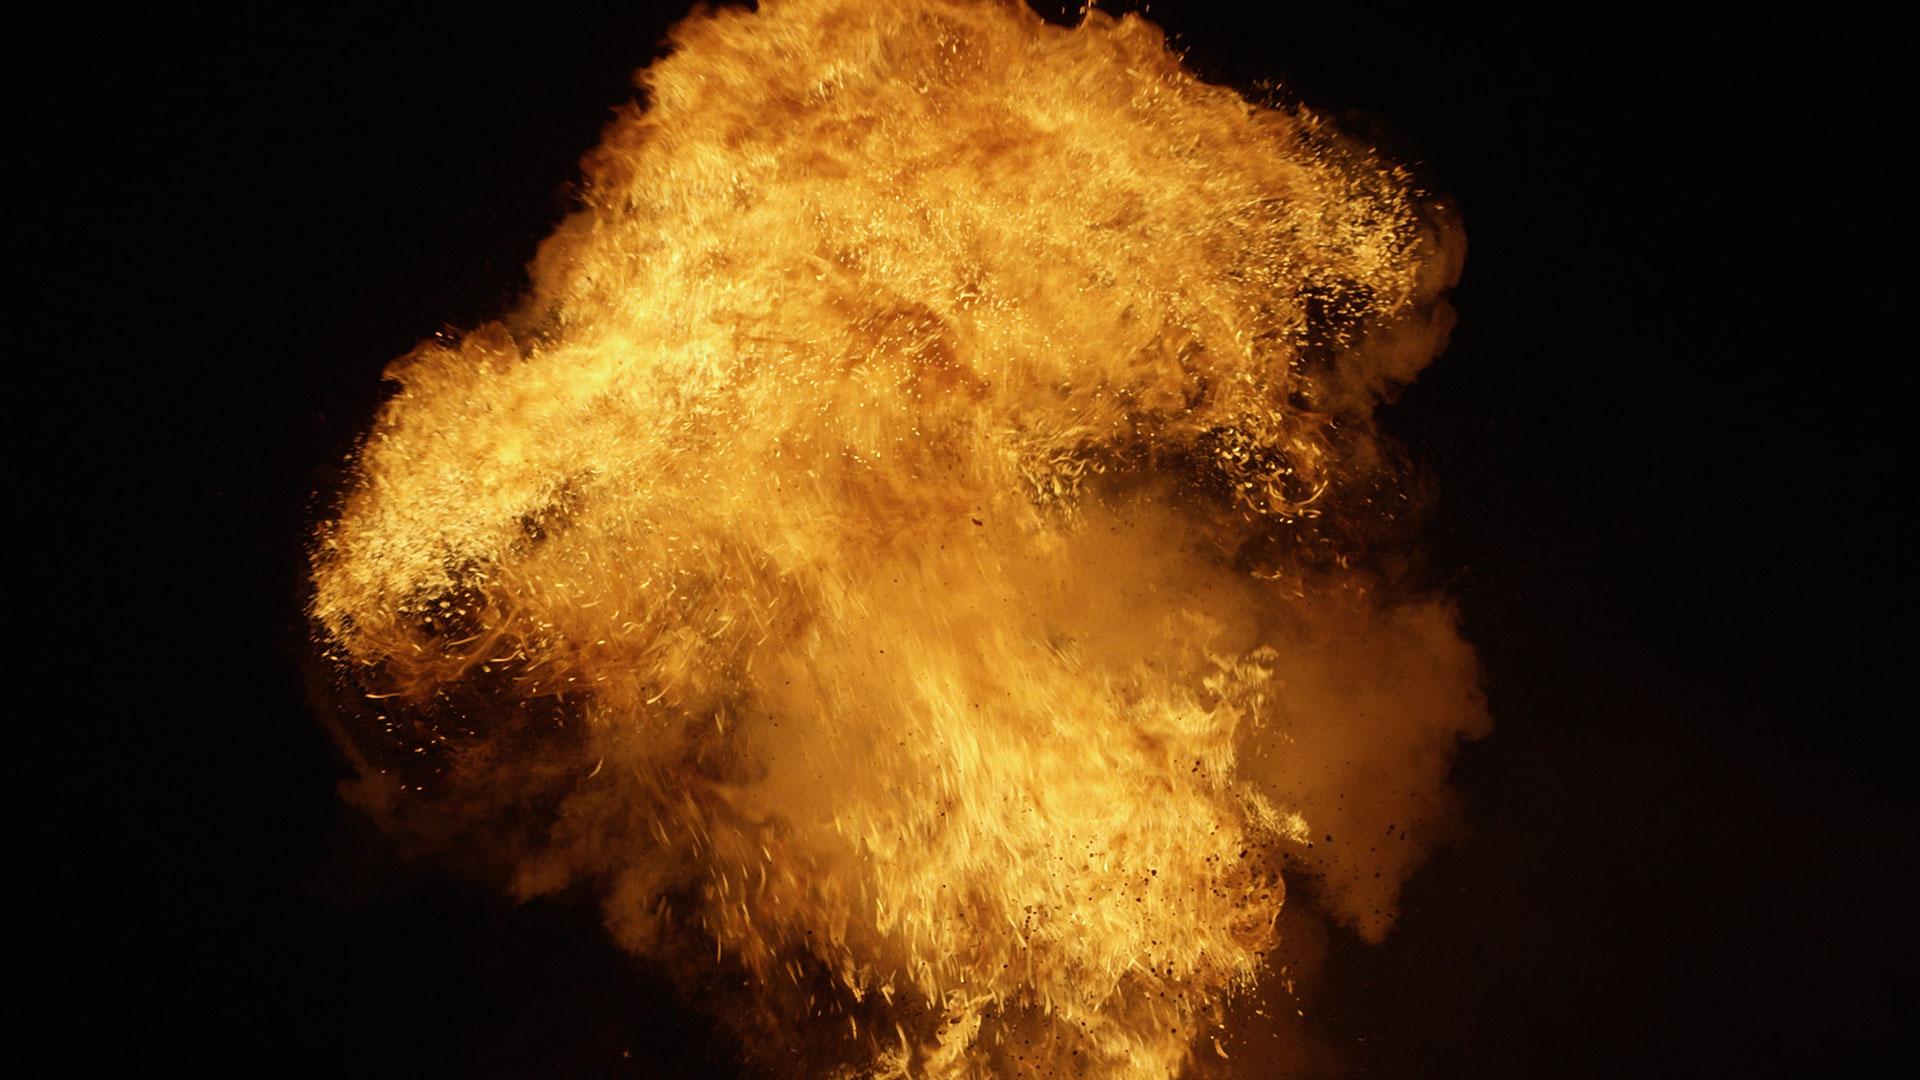 Chroma Key Explosion - before